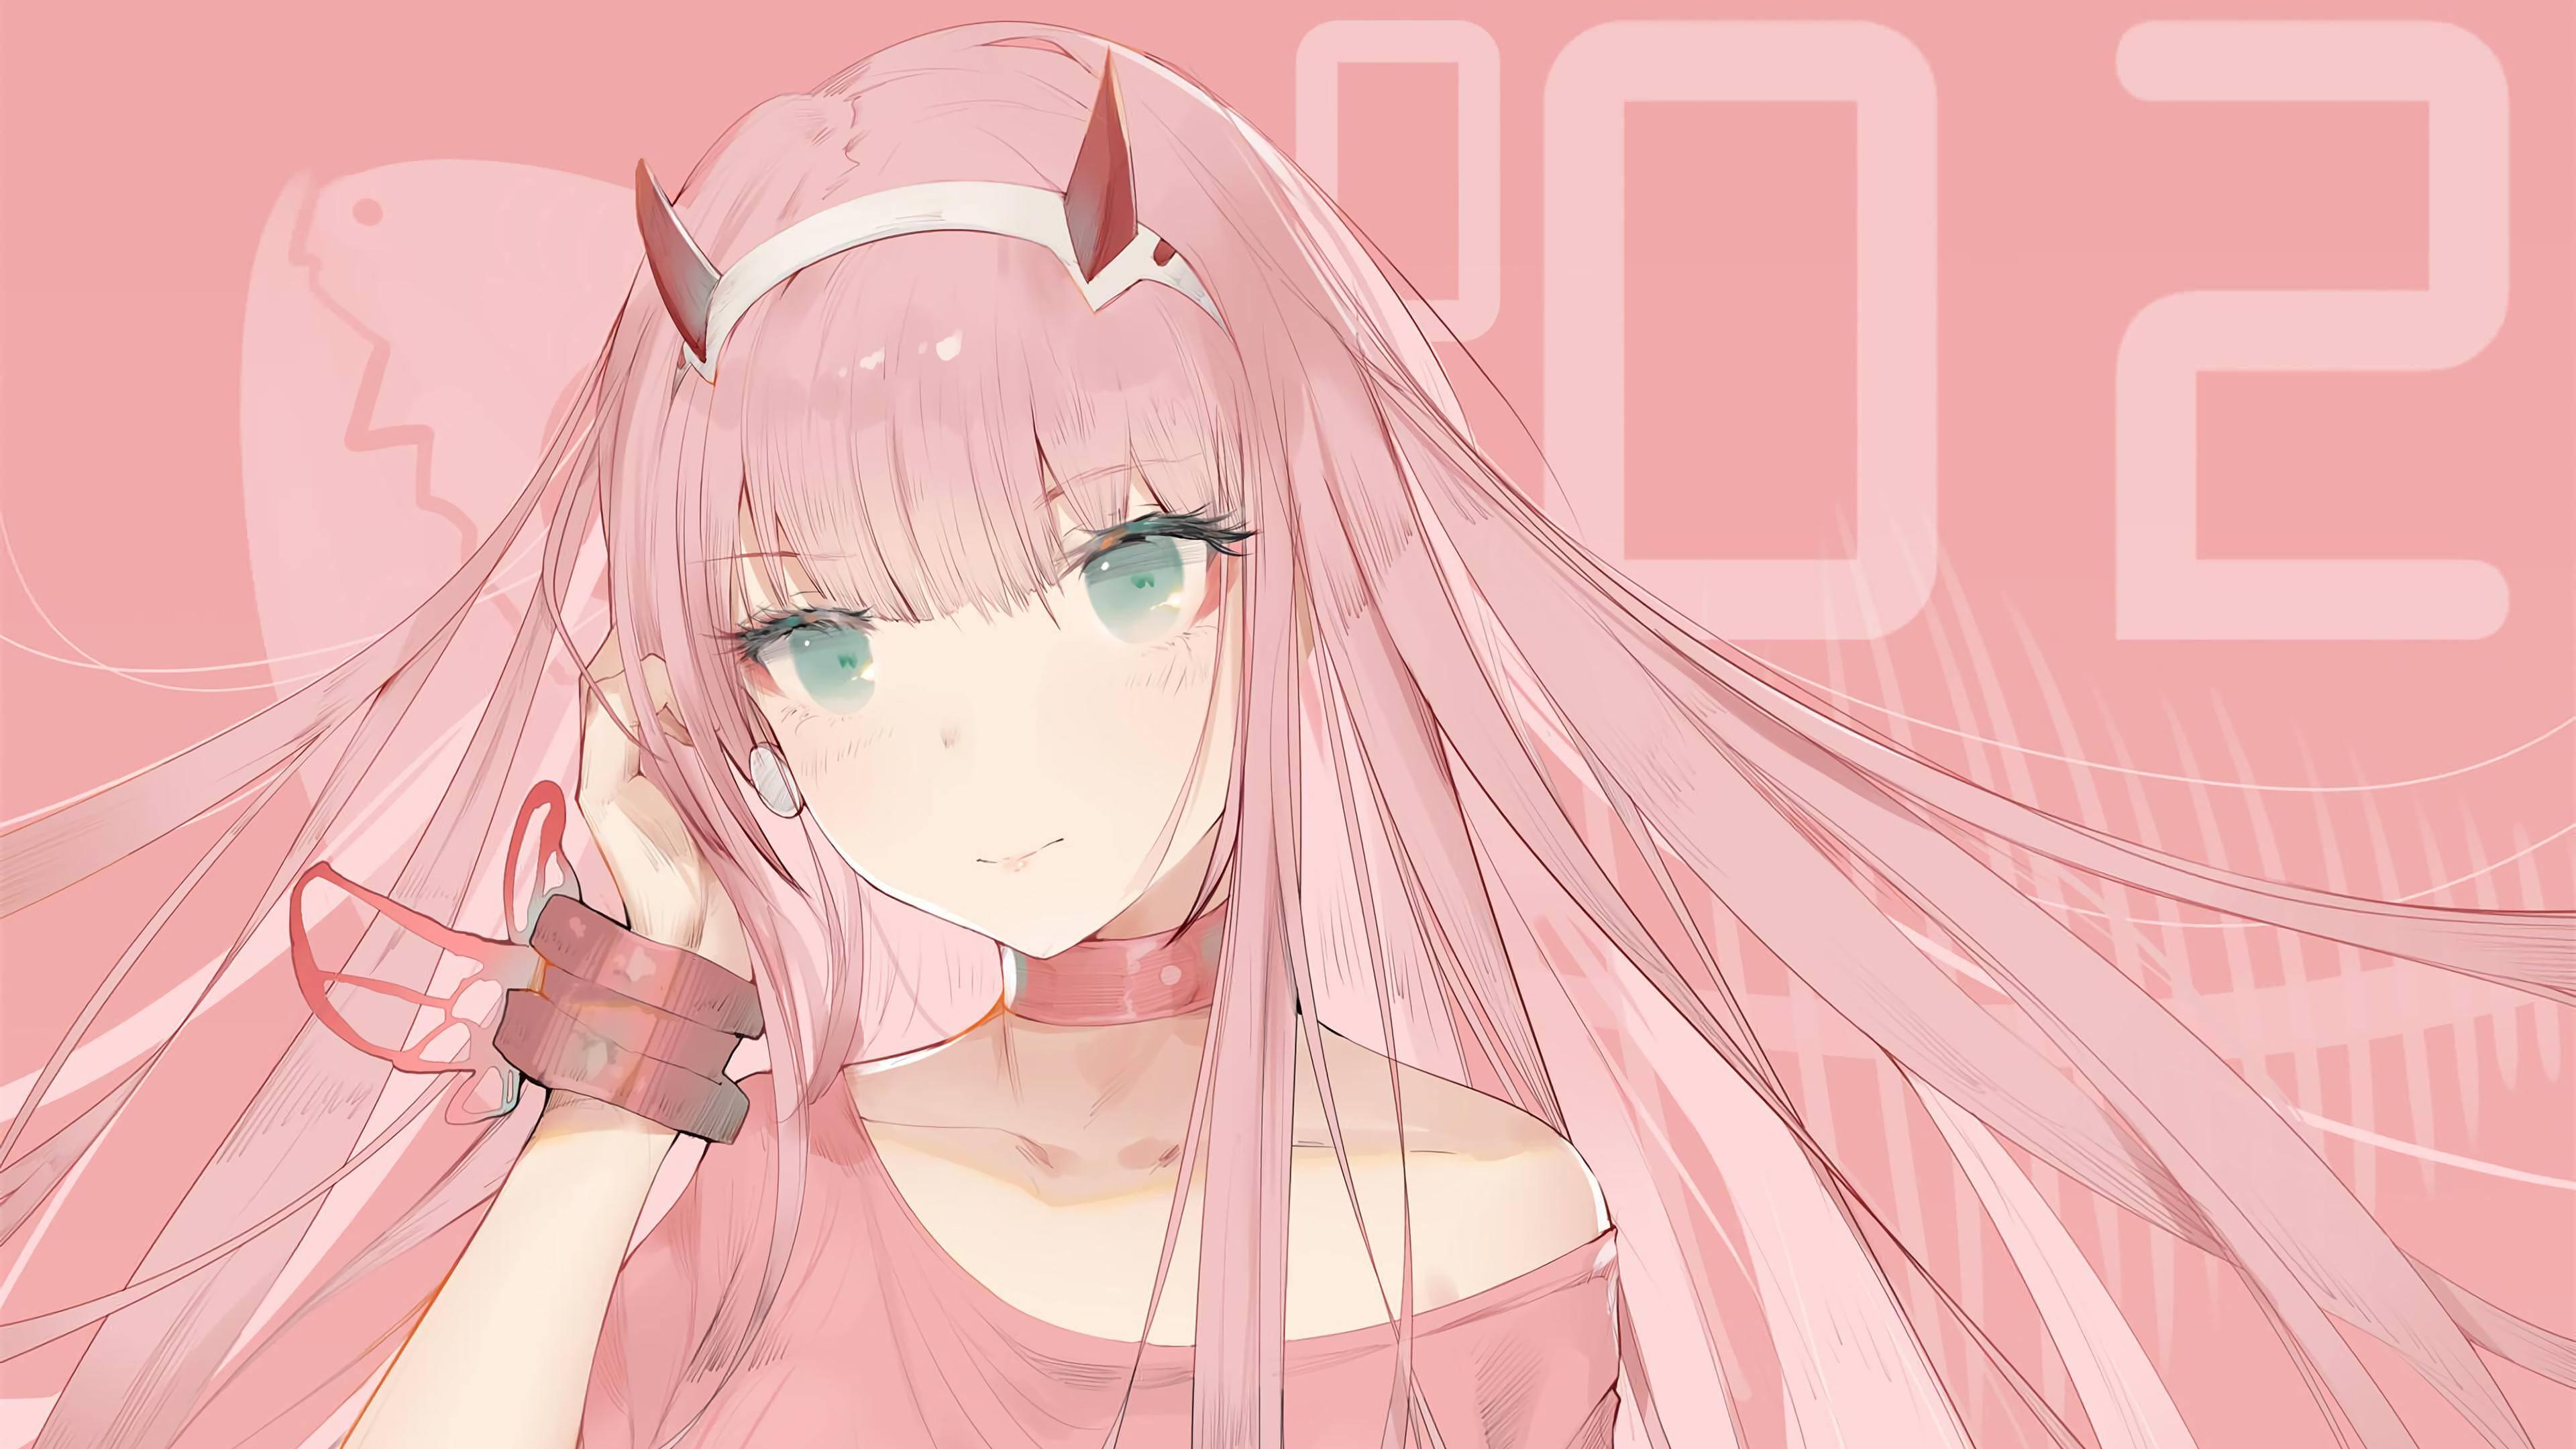 12+ Best For Zero Two Cute Wallpaper Hd - Lee Dii